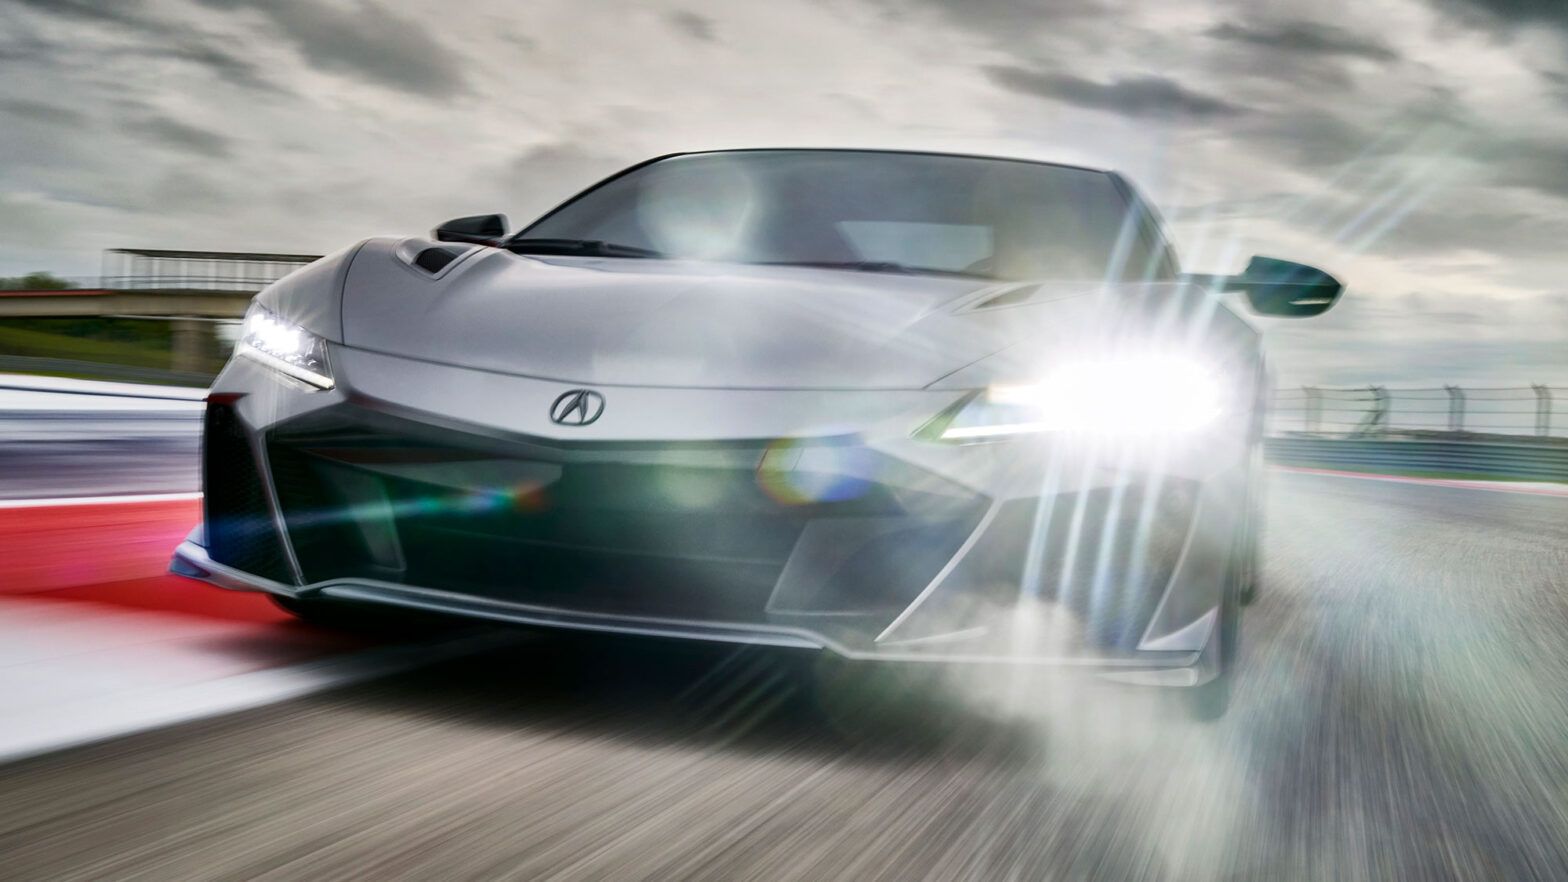 2022 Acura NSX Type S Supercar